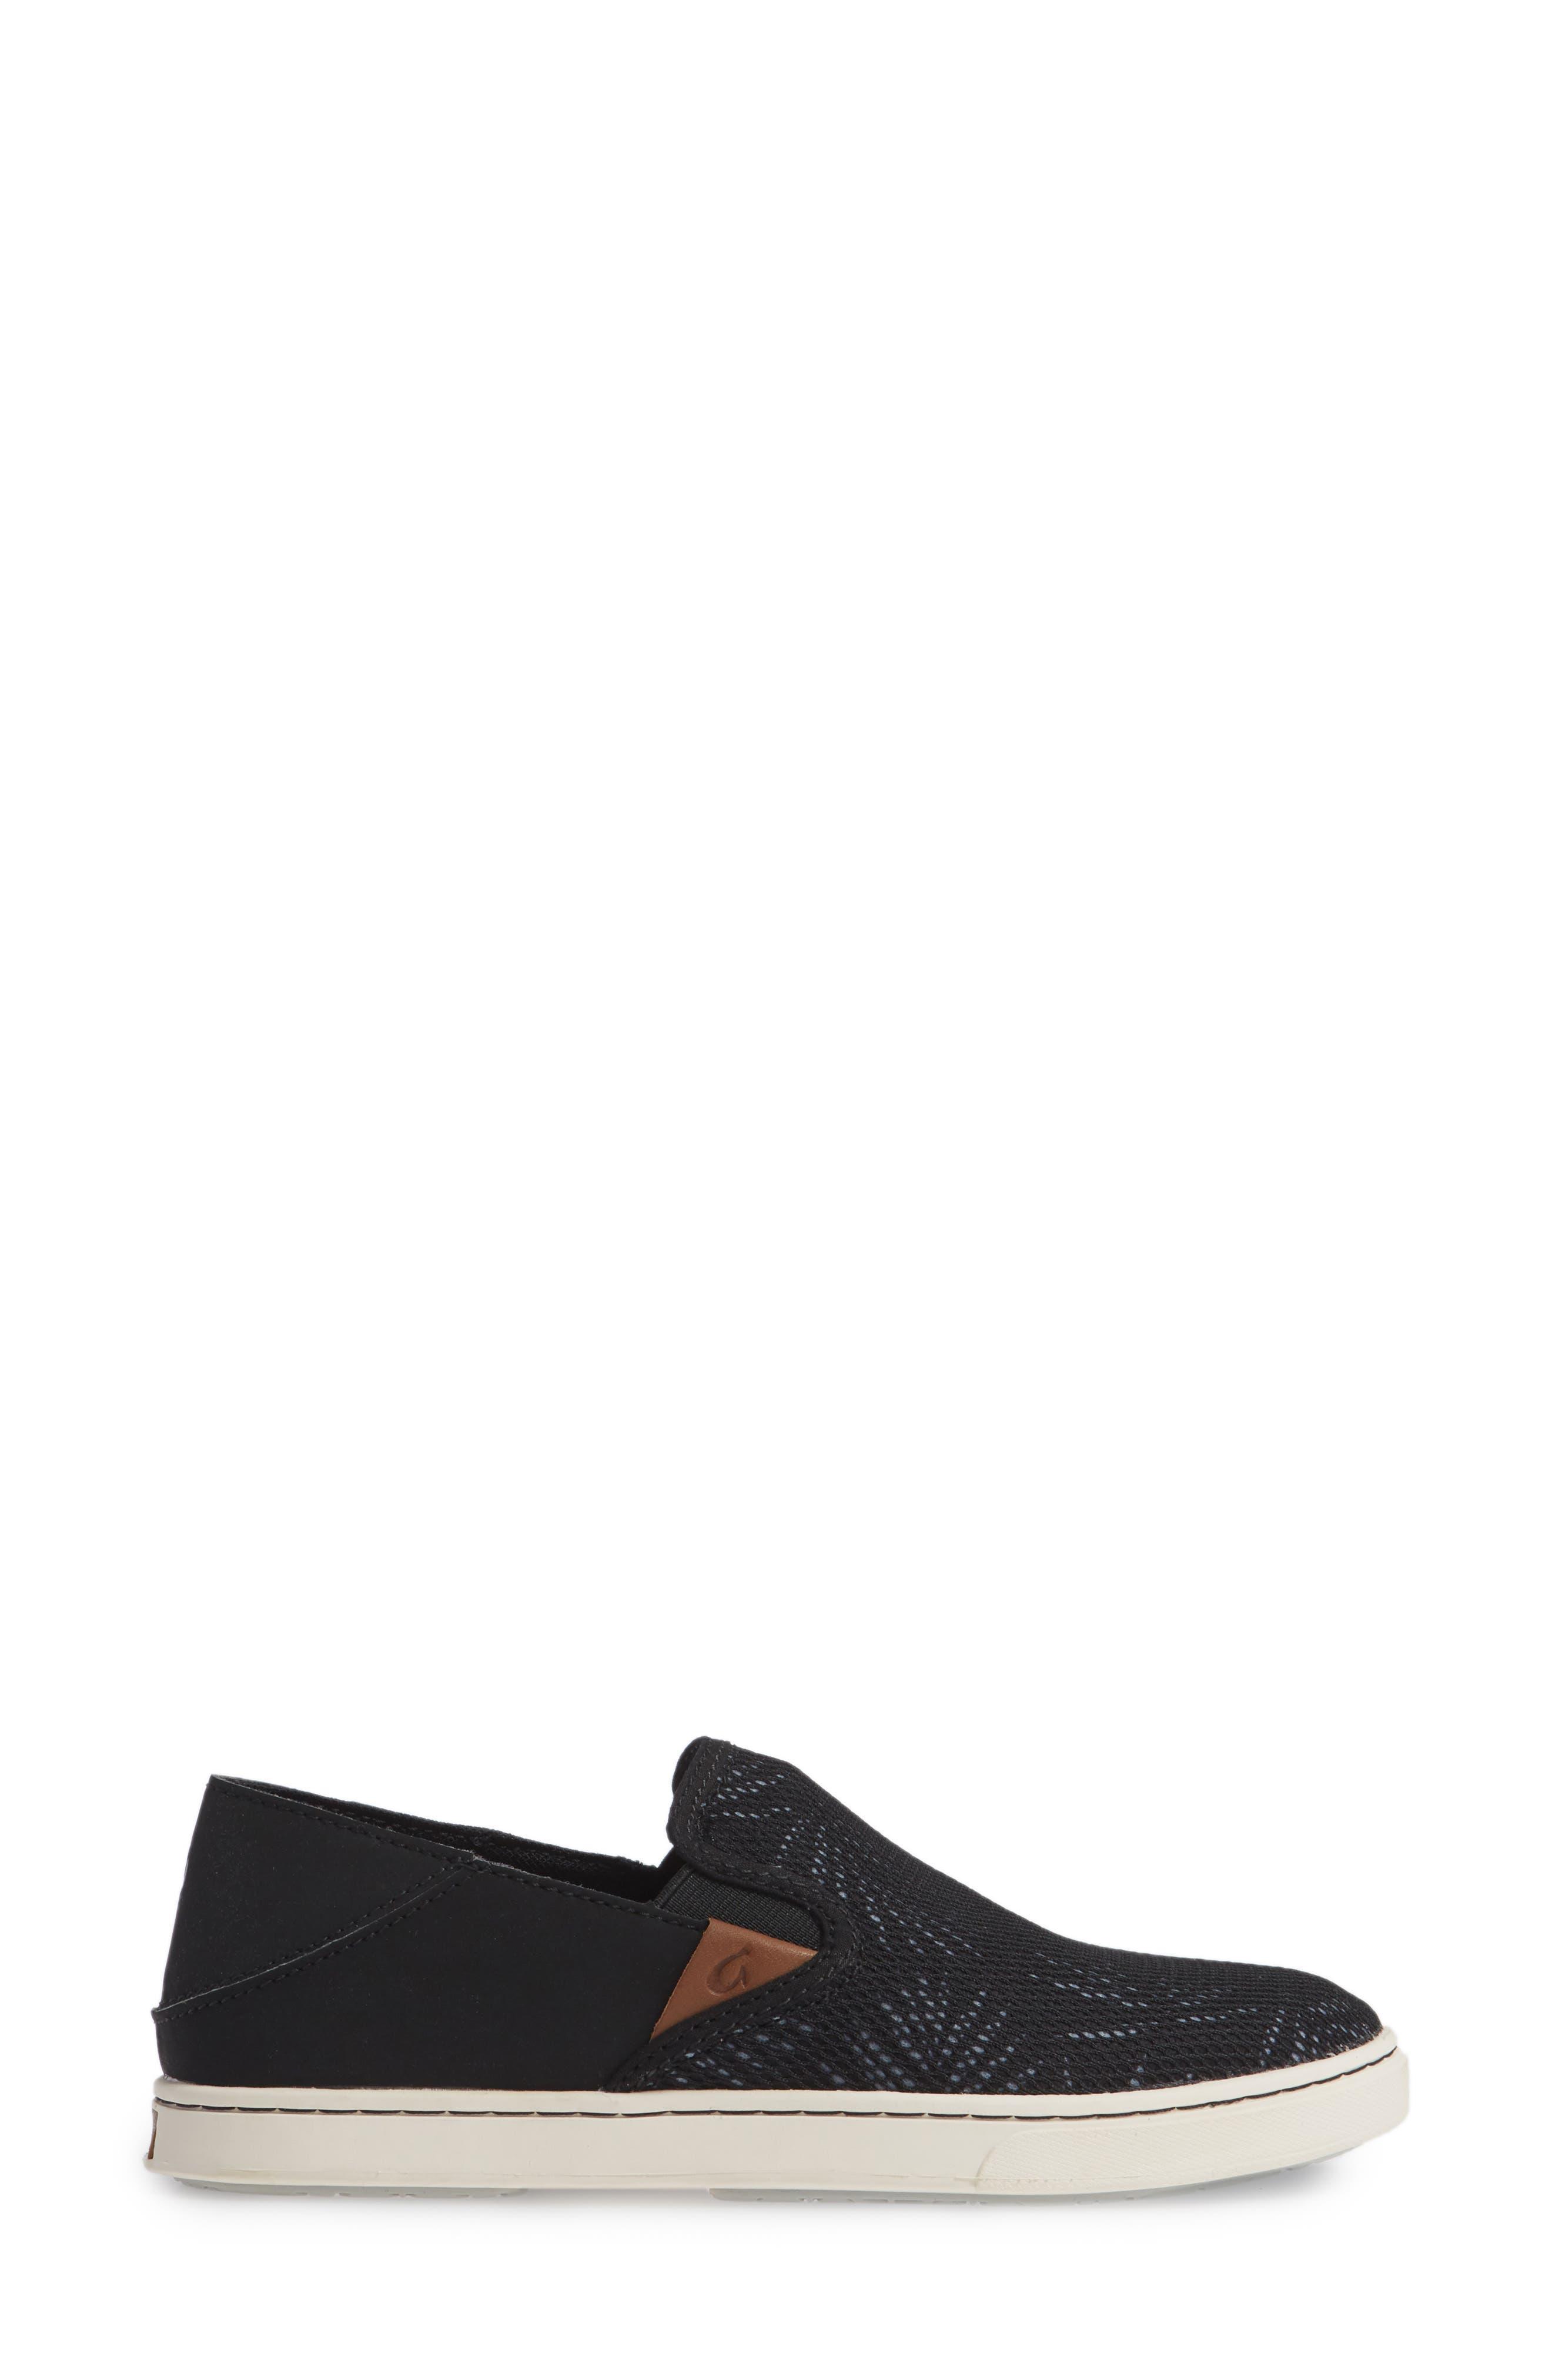 'Pehuea' Slip-On Sneaker,                             Alternate thumbnail 3, color,                             BLACK/ PALM FABRIC